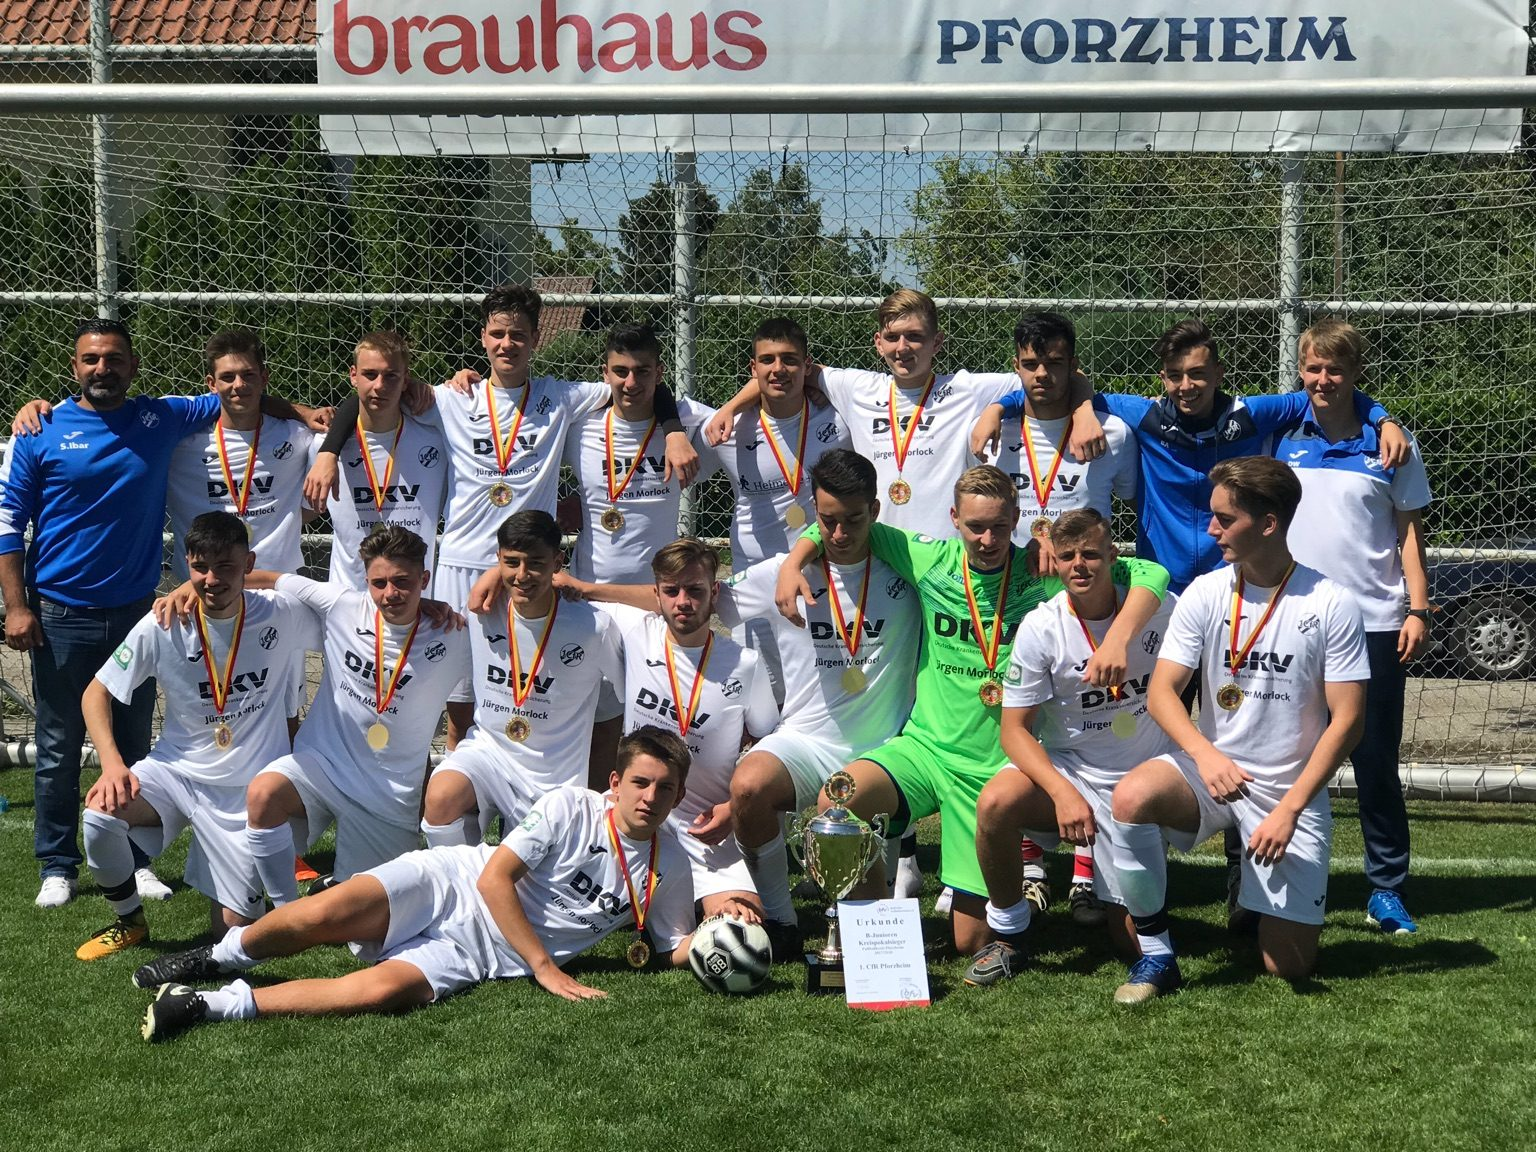 B1-Junioren gewinnen Kreispokal